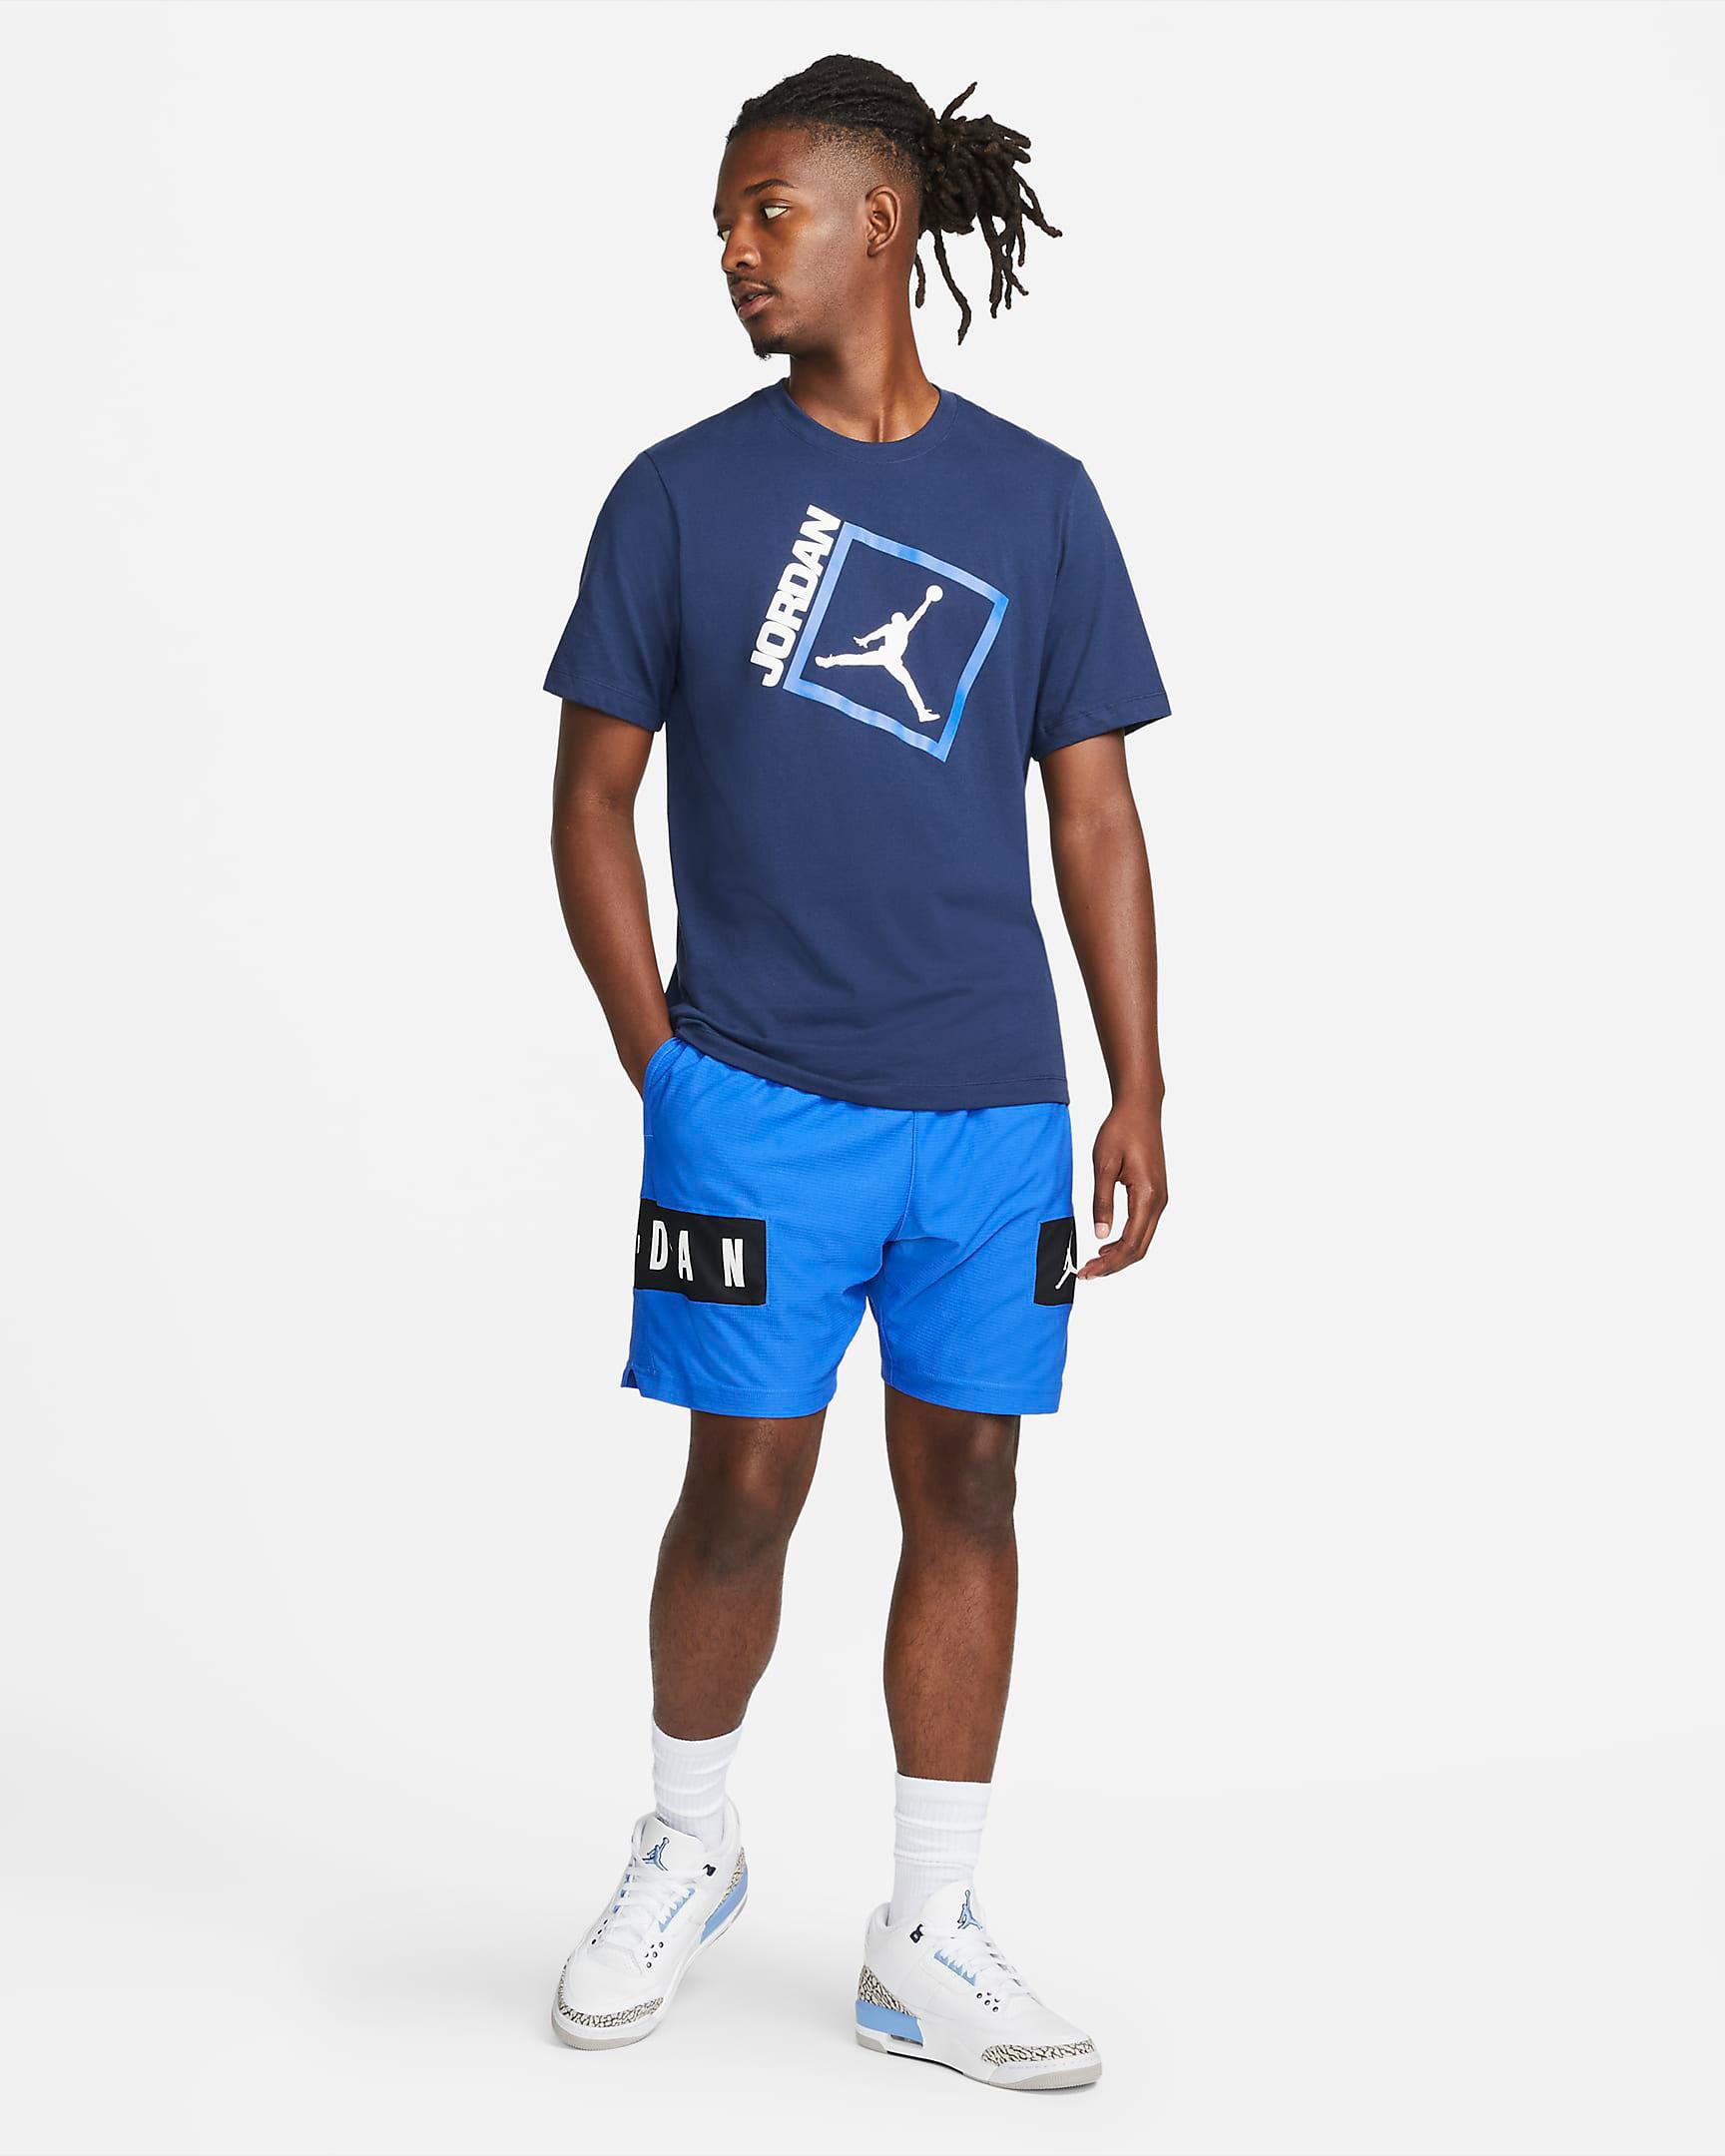 jordan-midnight-navy-t-shirt-shorts-outfit